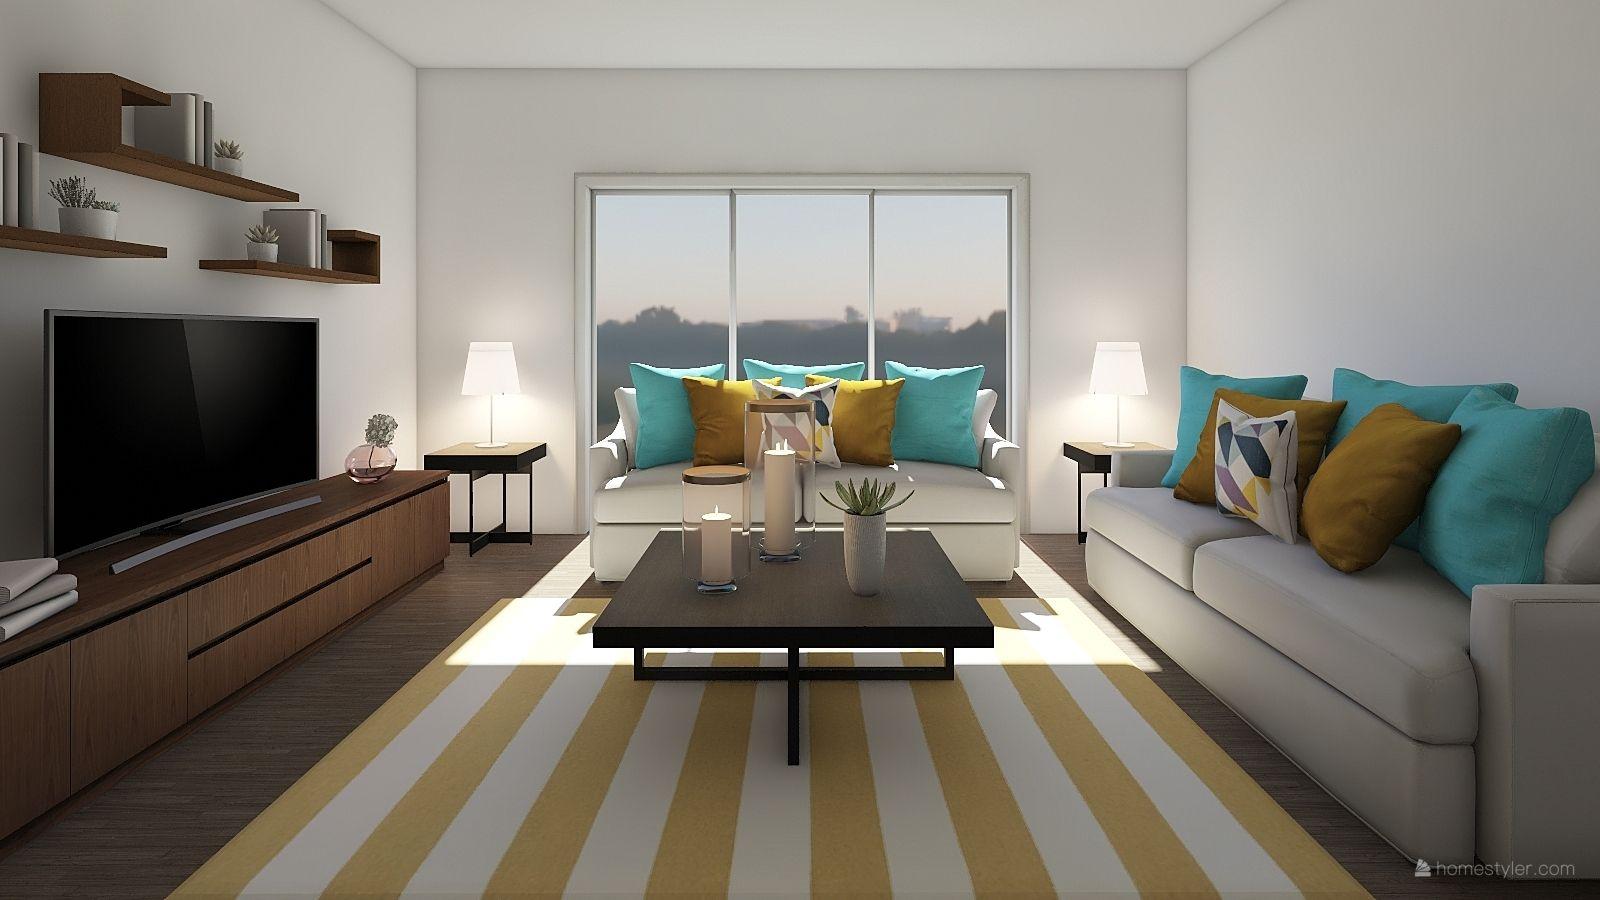 Living Room Design By Andrea Carazas 3d Home Design Software